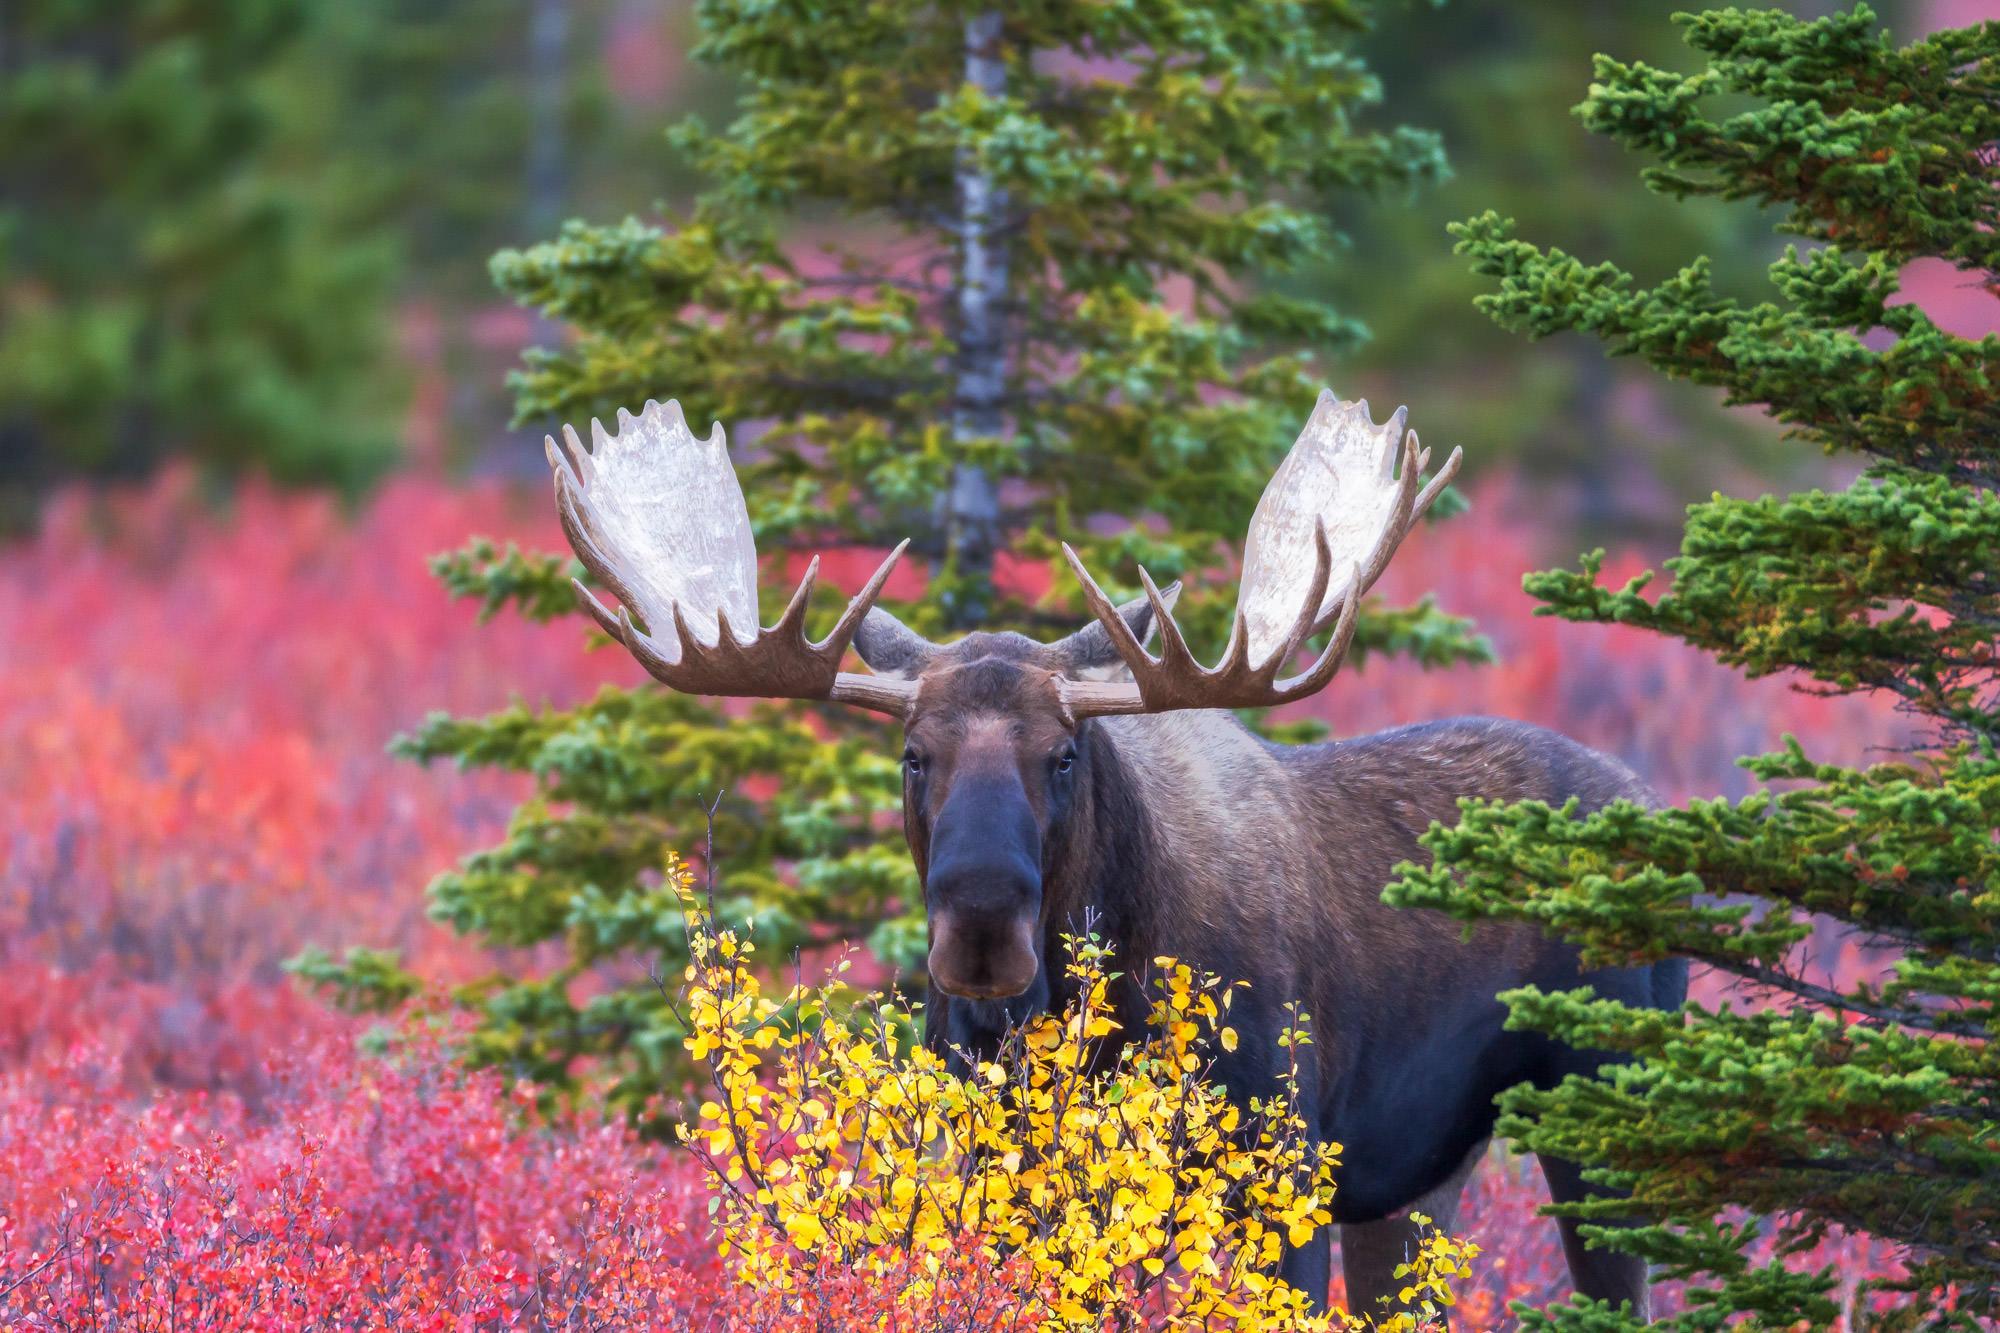 Moose, Bull Moose, Alaska, Denali, limited edition, photograph, fine art, wildlife, photo